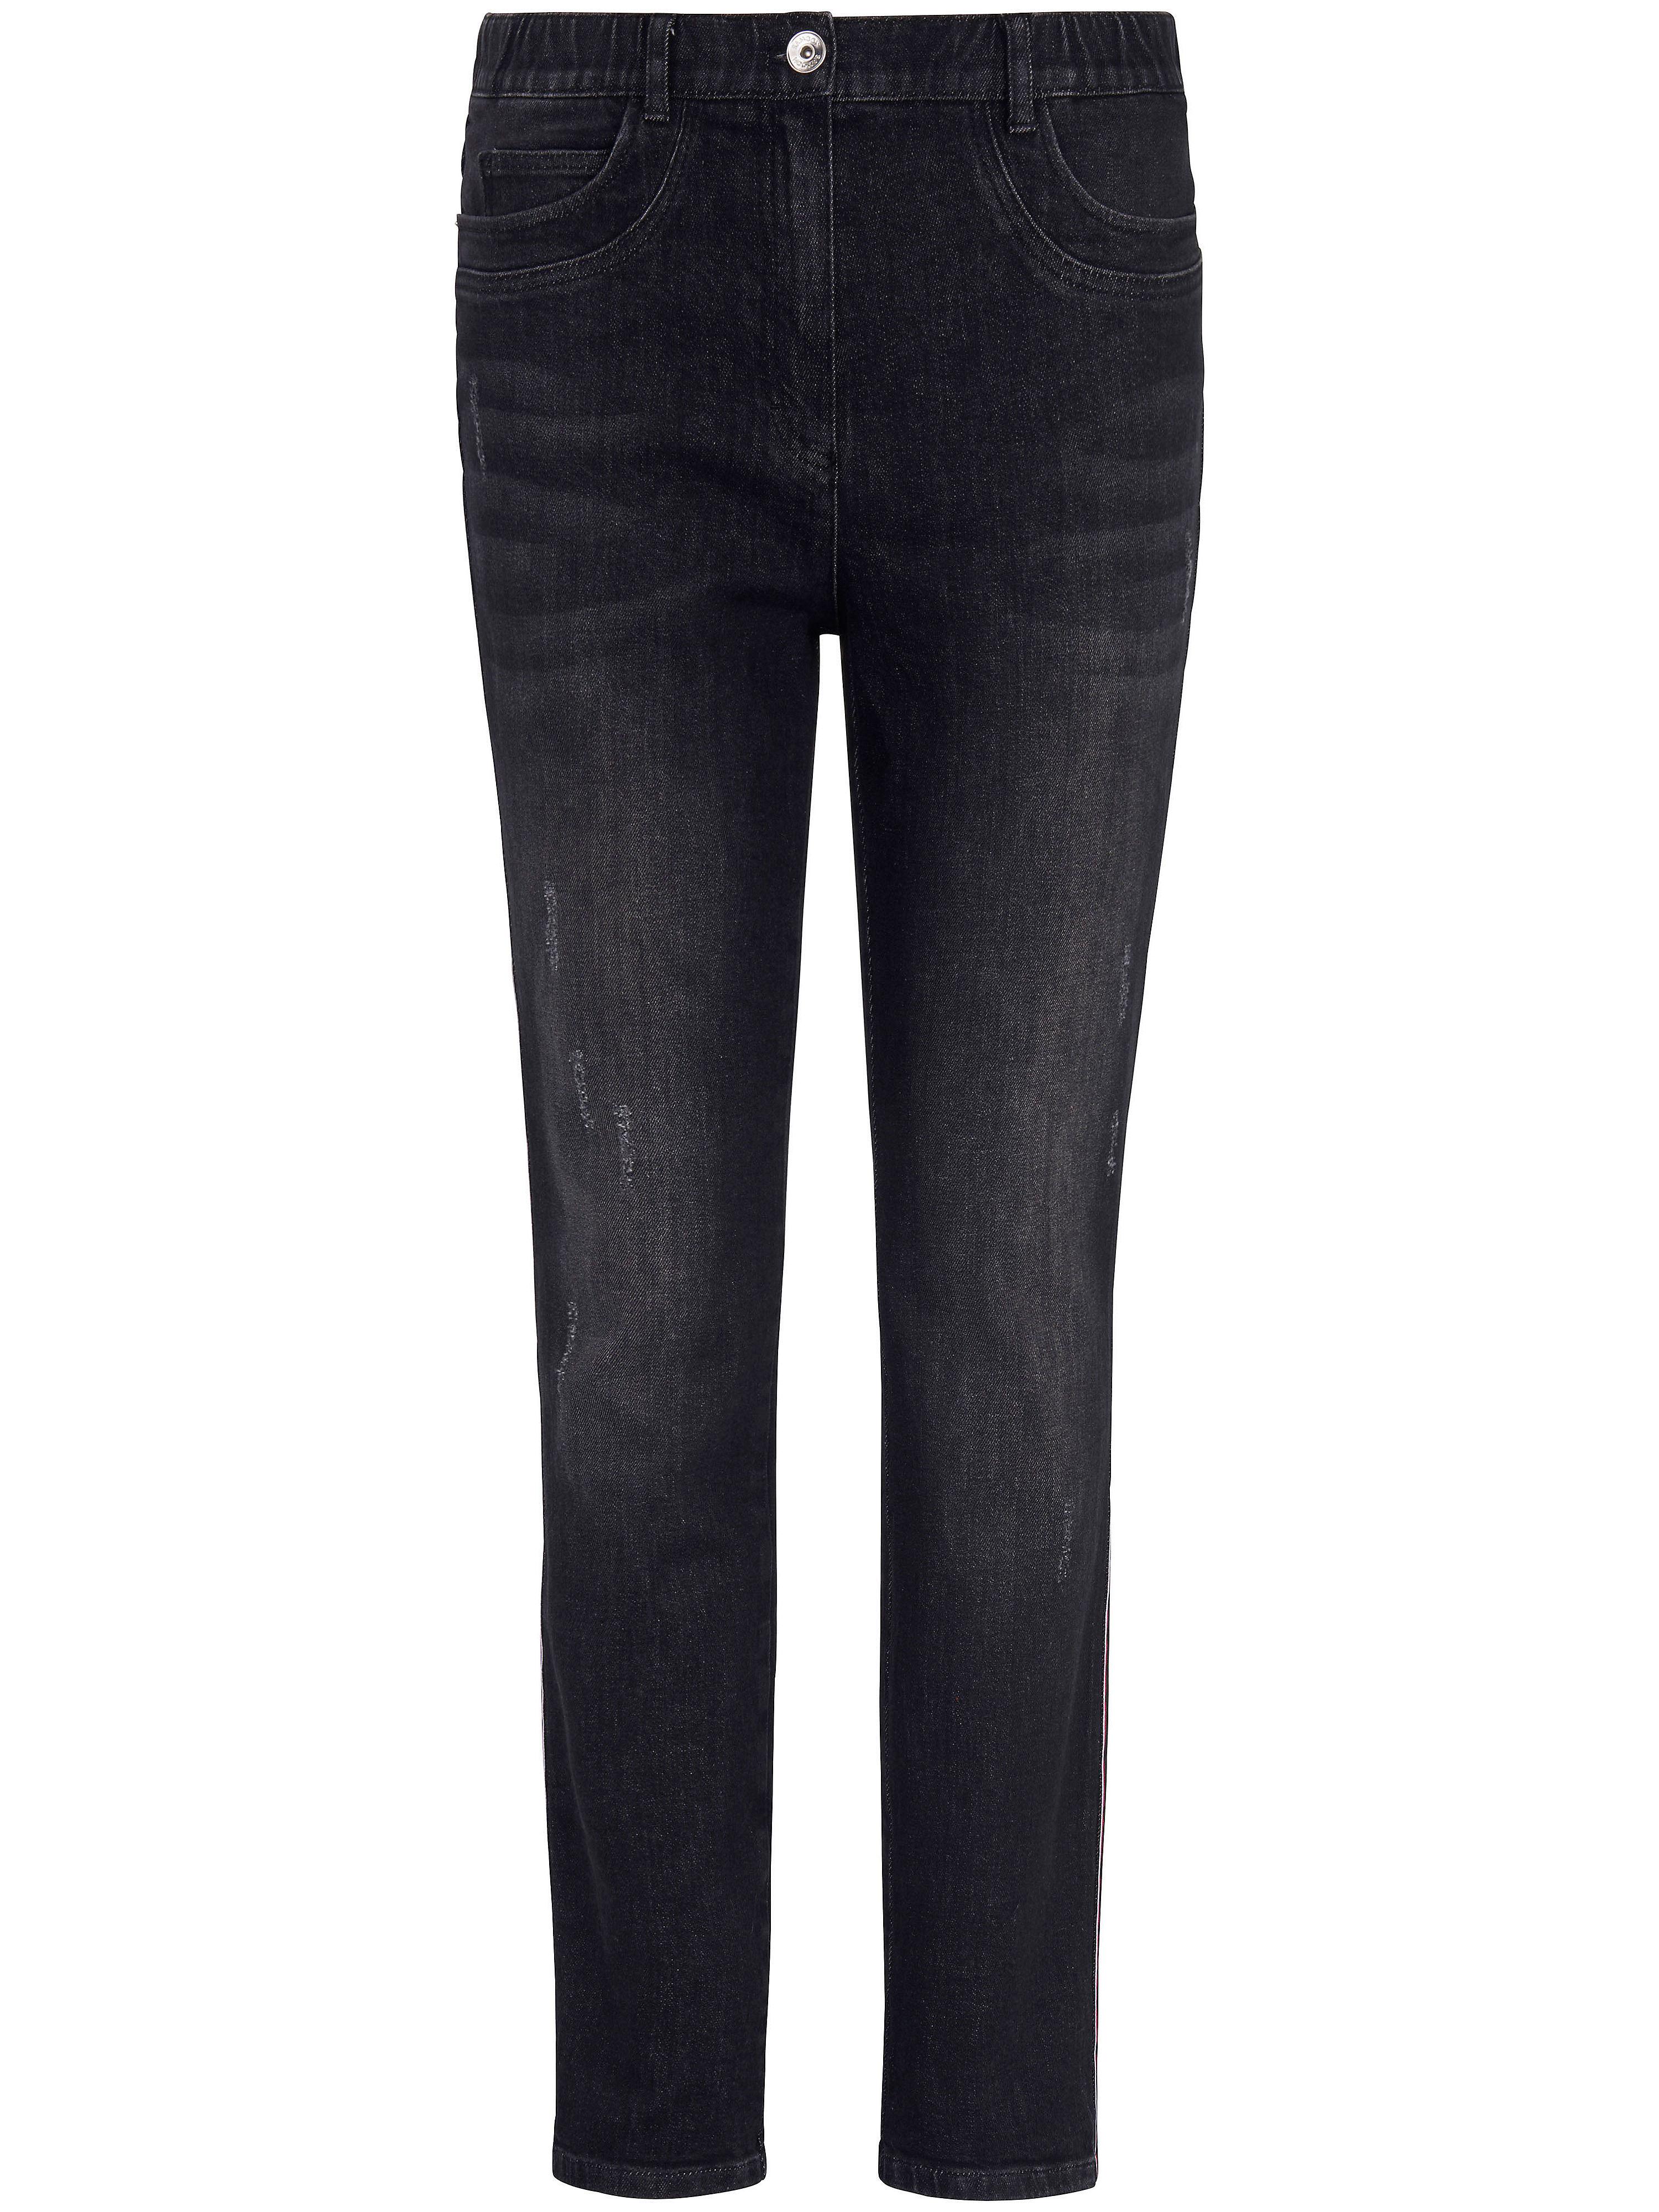 Image of   7/8 Jeans Fra Samoon sort